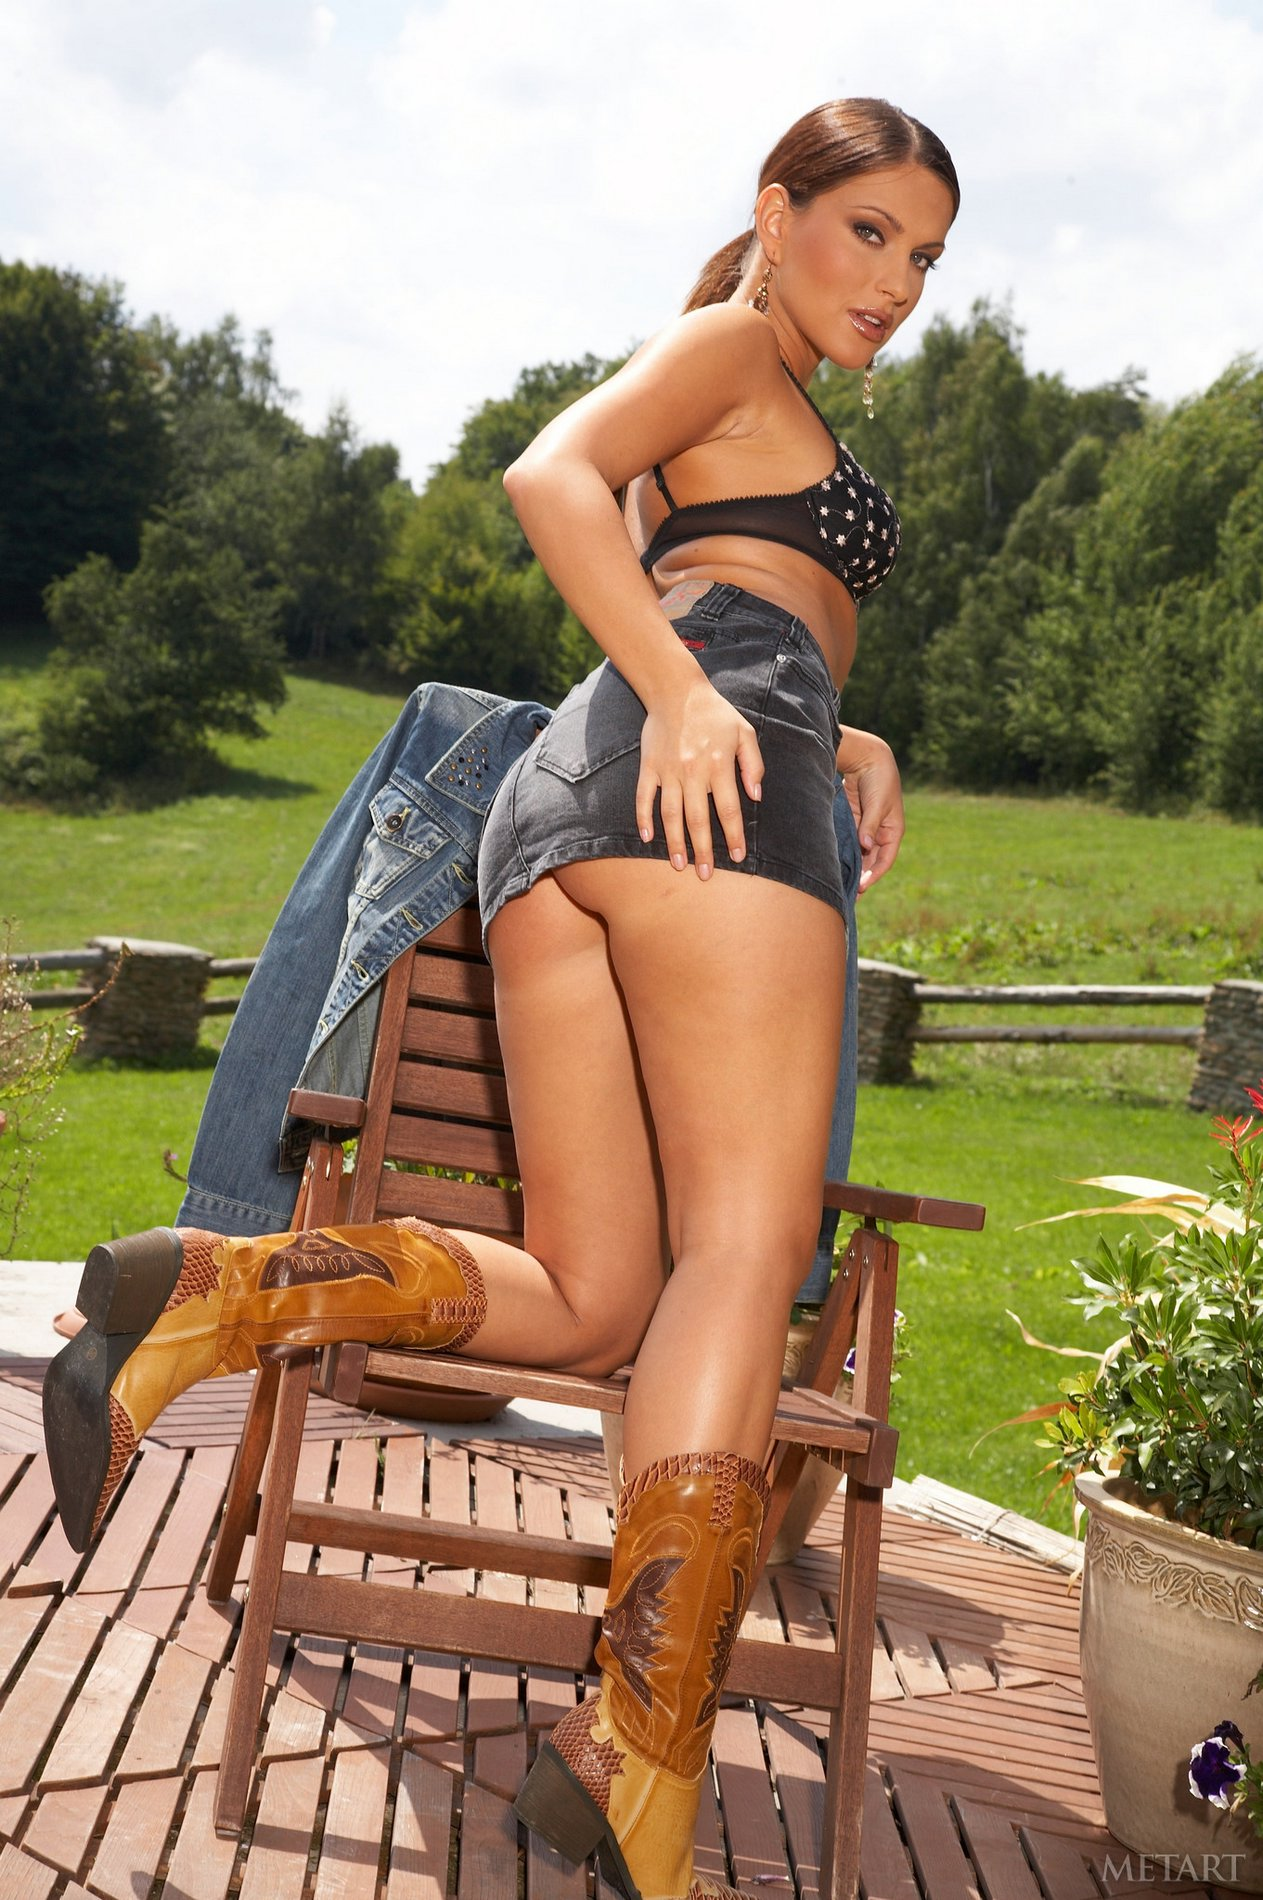 Marketa Brymova in sexy boots shows off her hot body ...